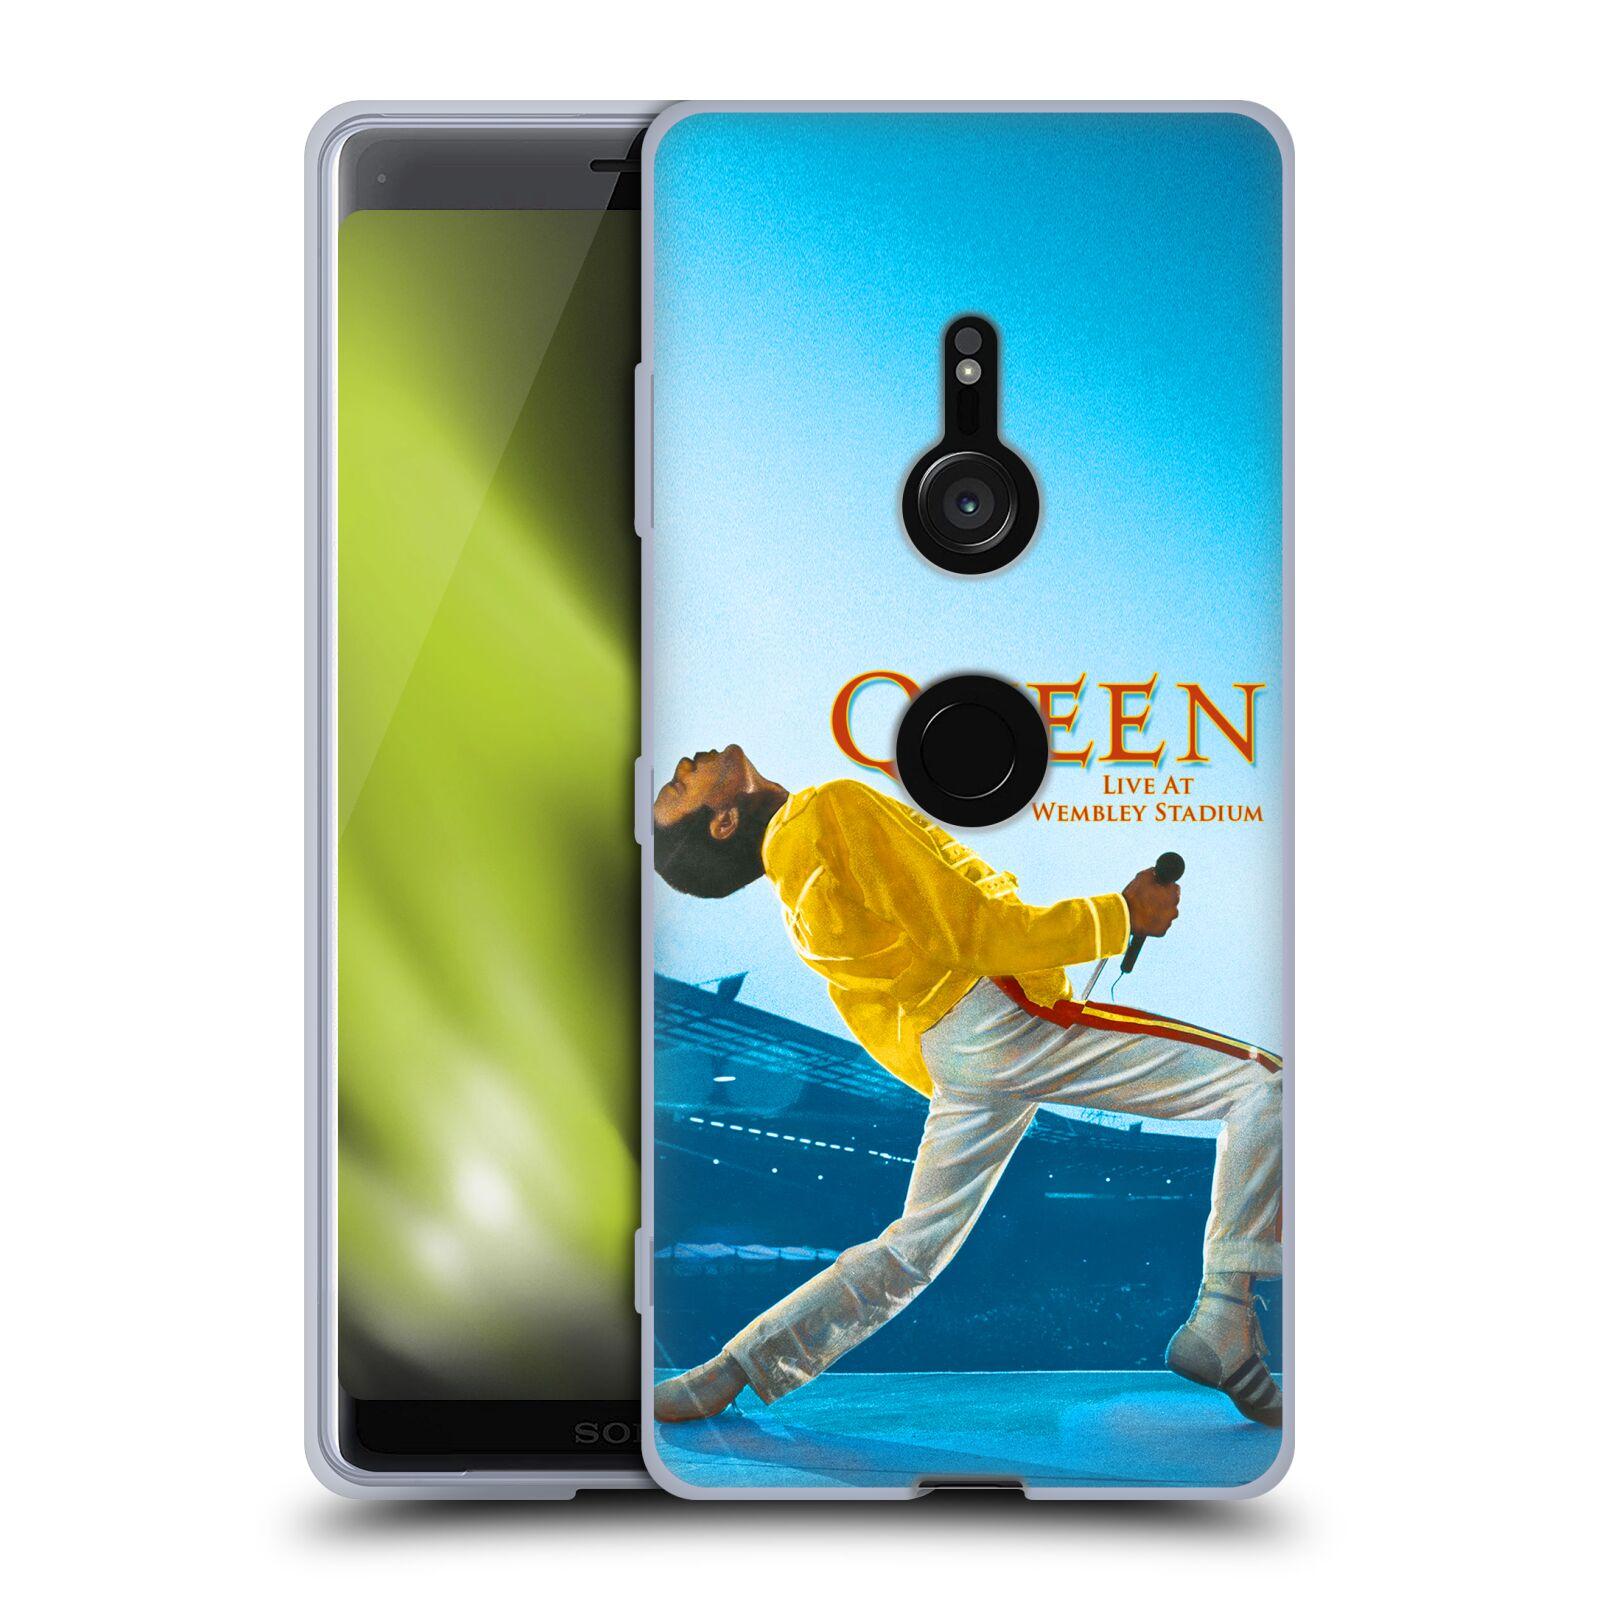 Silikonové pouzdro na mobil Sony Xperia XZ3 - Head Case - Queen - Freddie Mercury